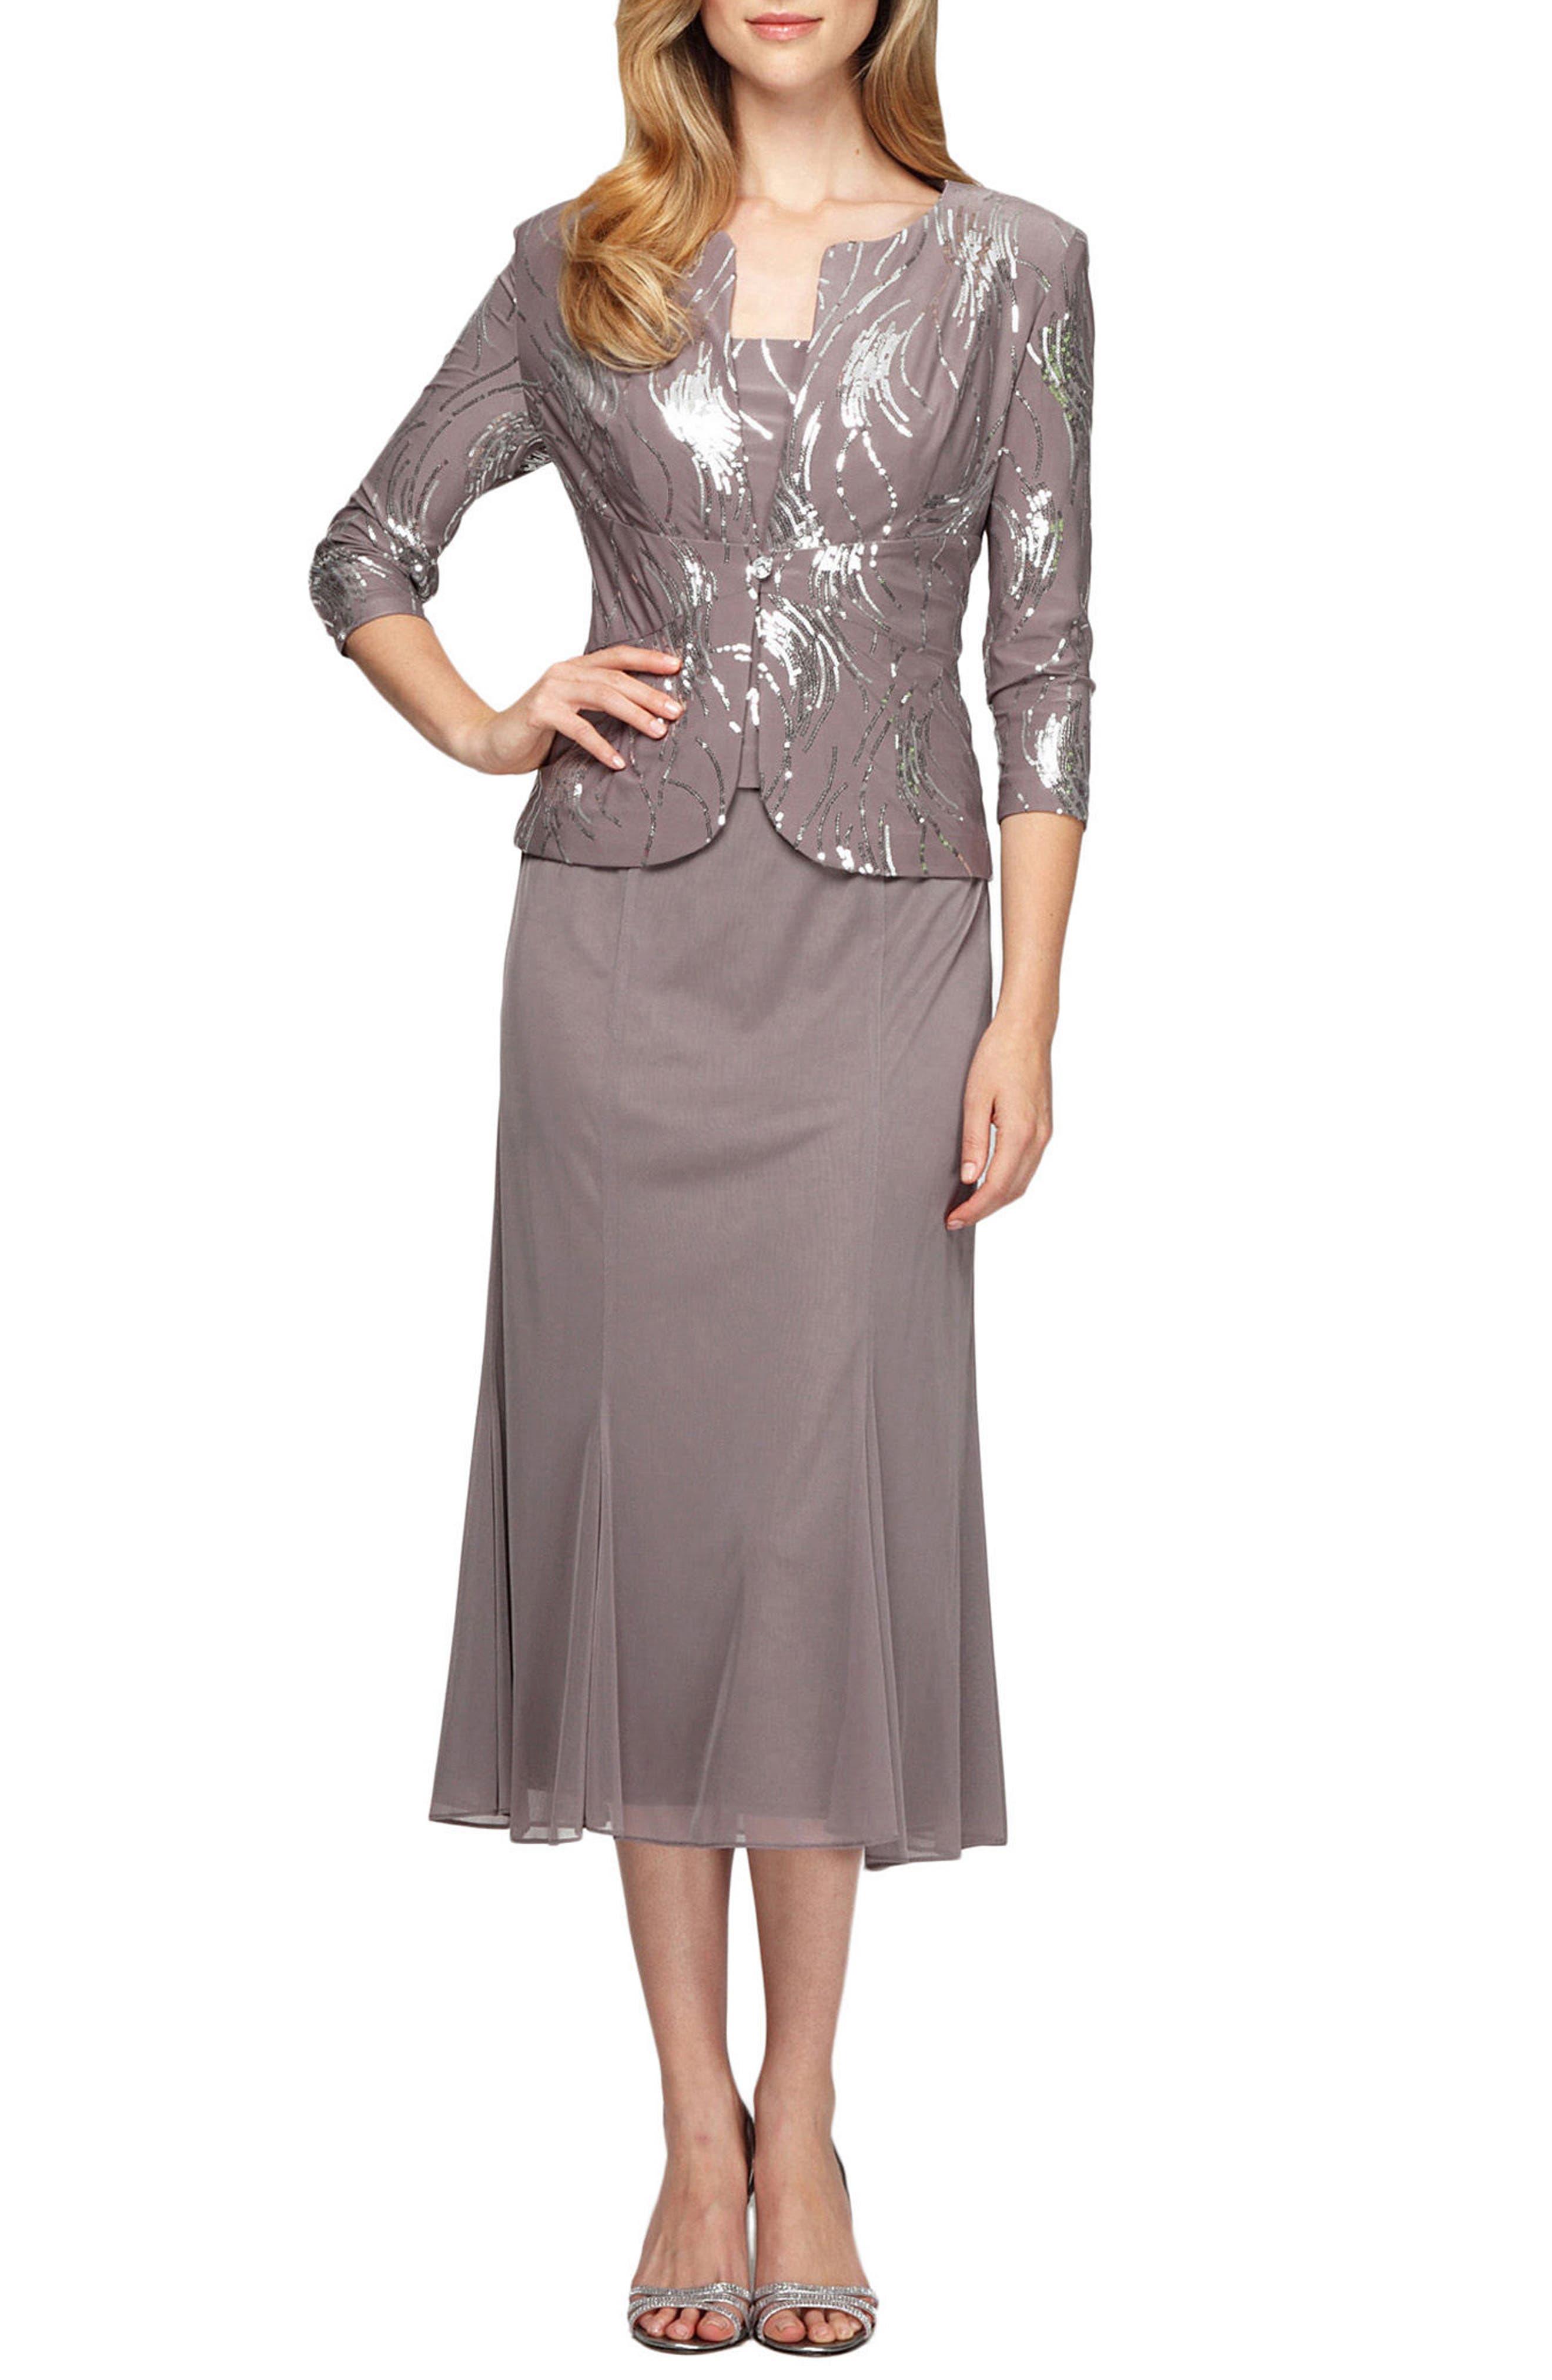 1920s, 1930s Mother of the Bride Groom Dresses Womens Alex Evenings Midi Dress  Jacket Size 18 - Grey $169.99 AT vintagedancer.com